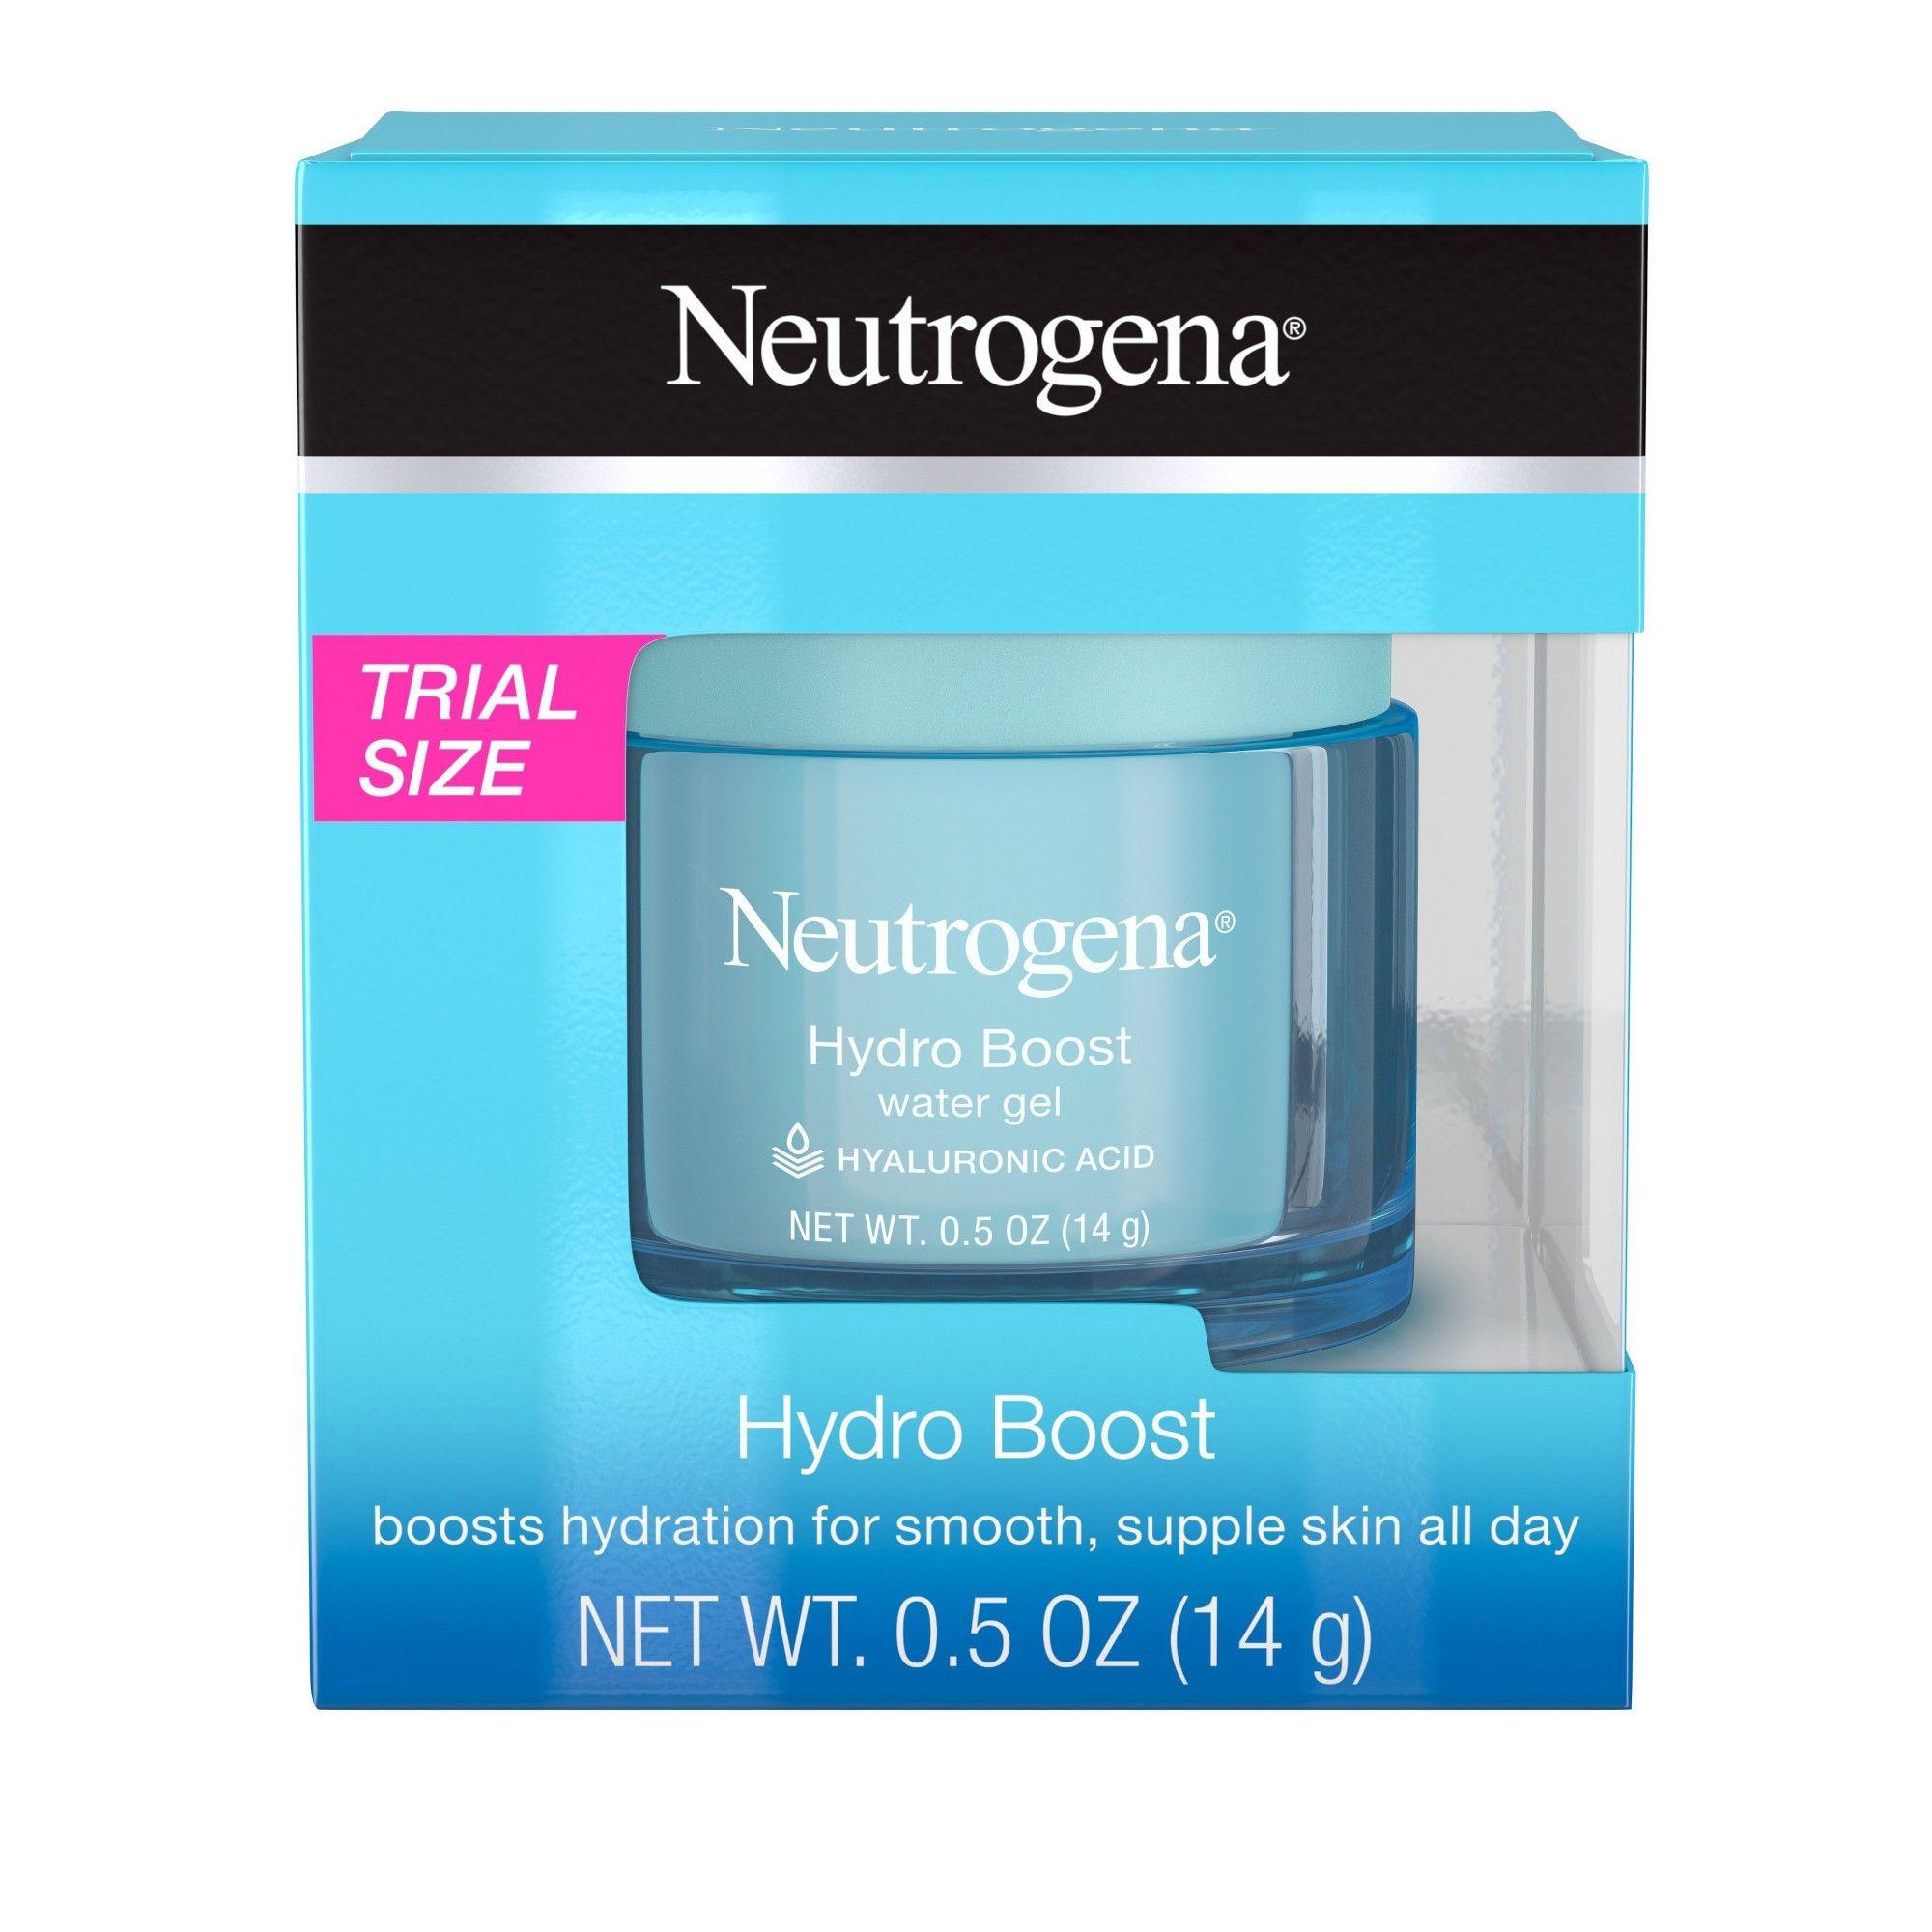 Neutrogena Hydro Boost Hydrating Water Gel Face